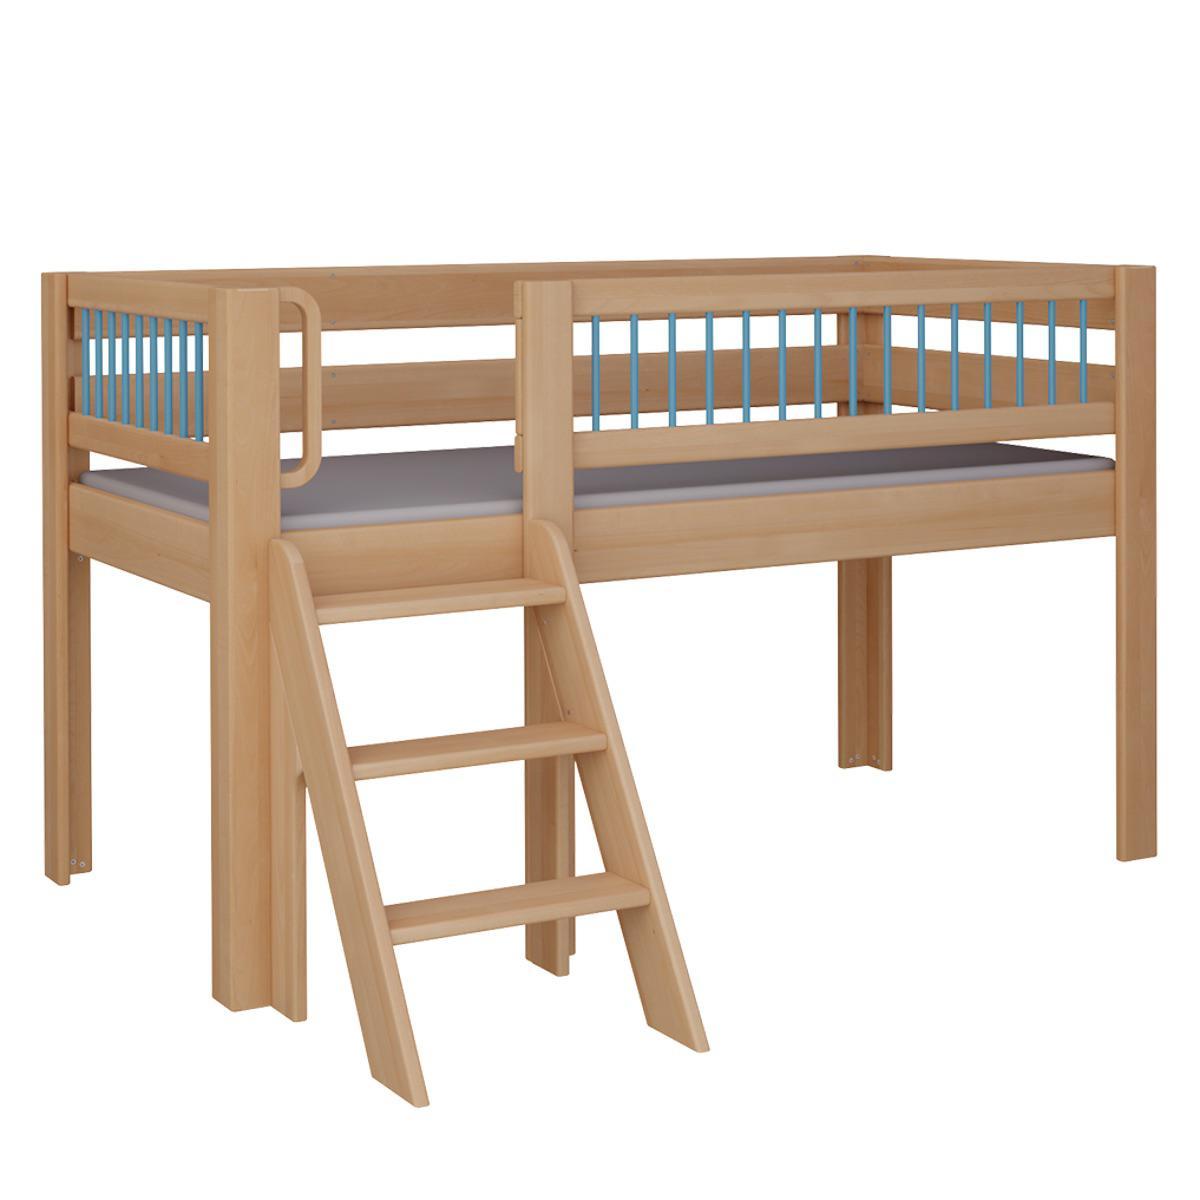 Kubu halbhohes Spielbett mit Treppe DELUXE De Breuyn natur geölt Rundstäbe blau